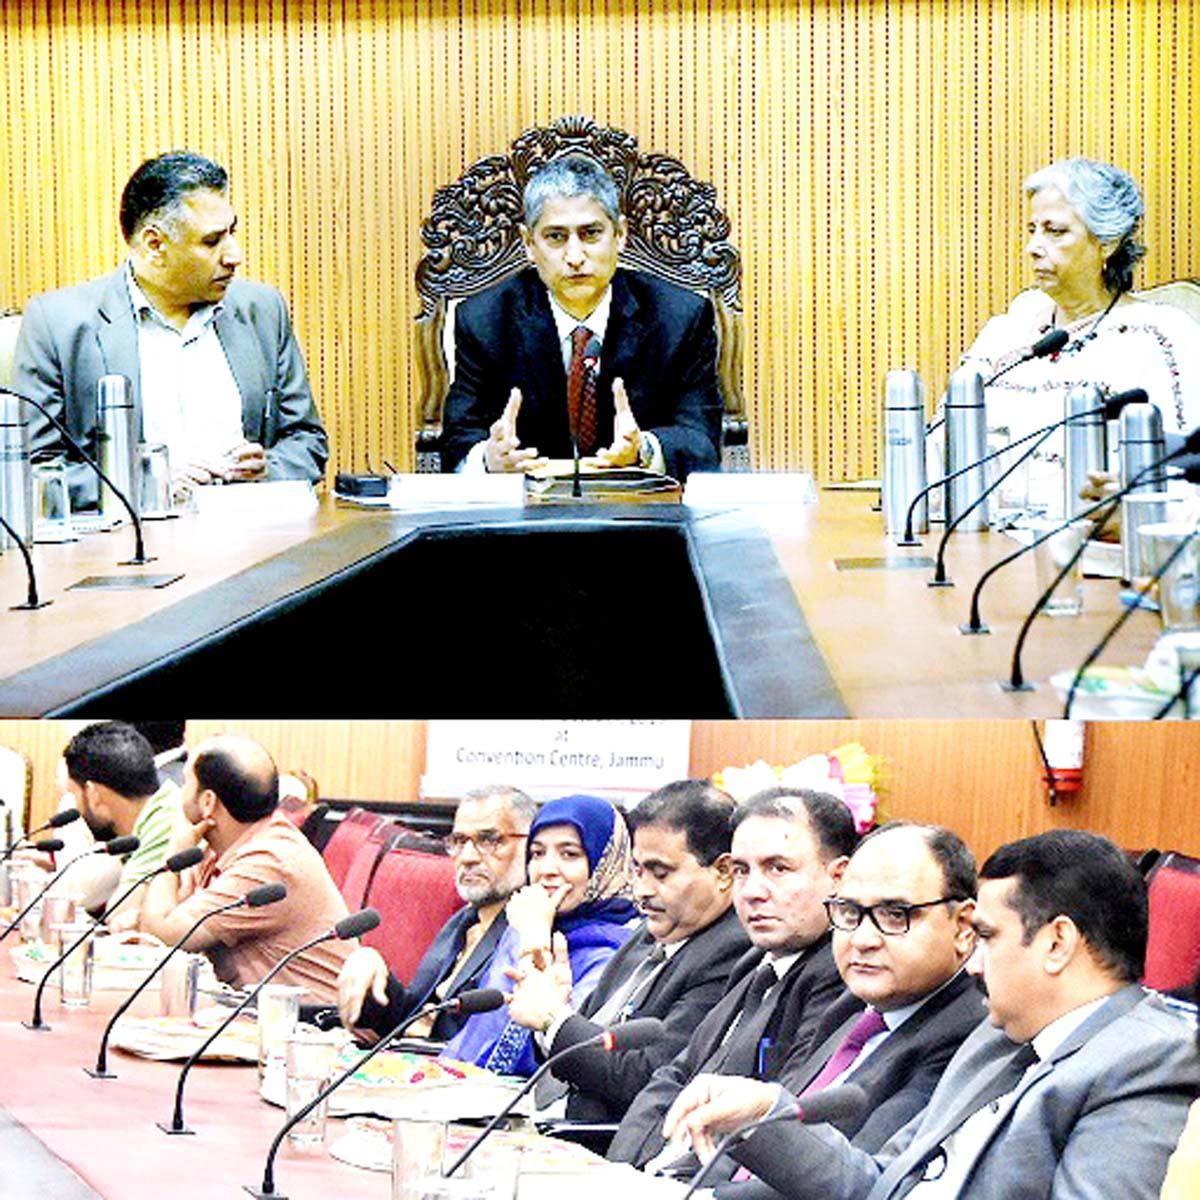 Justice Dhiraj Singh Thakur speaking during Orientation, Consultation Prog on Juvenile Justice Act.